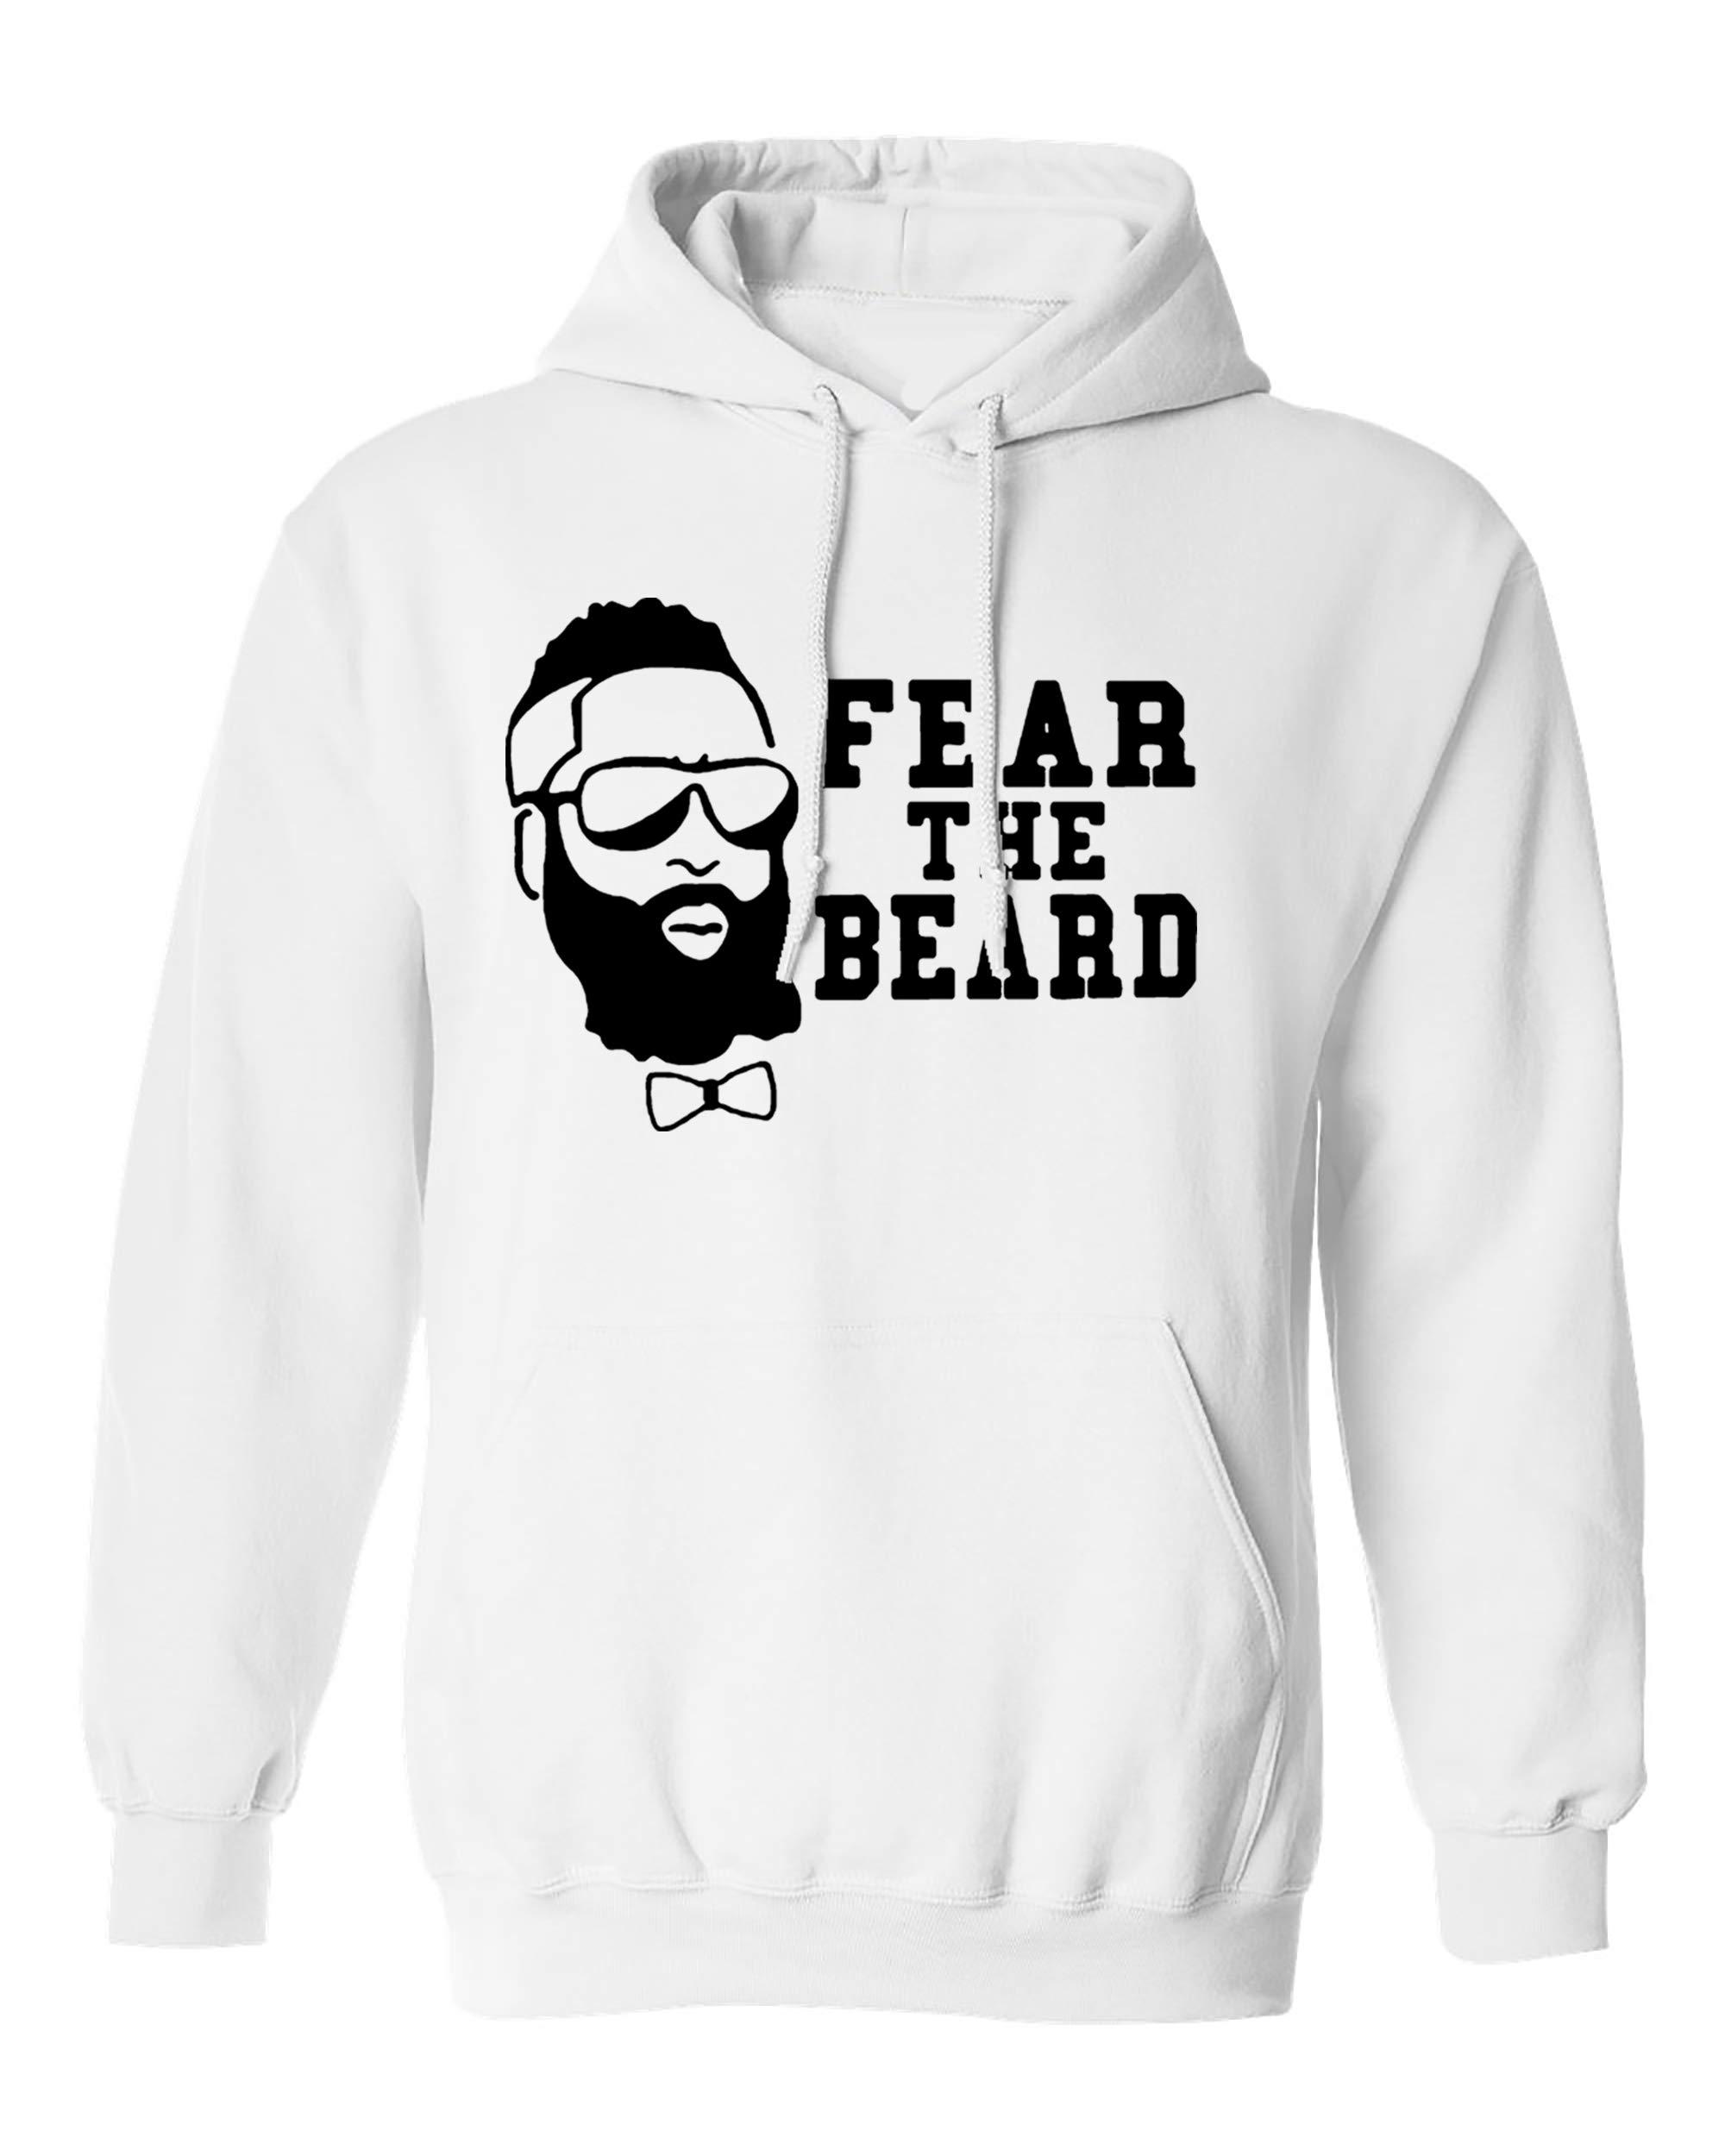 R The Beard Harden Basketball Houston Shirts